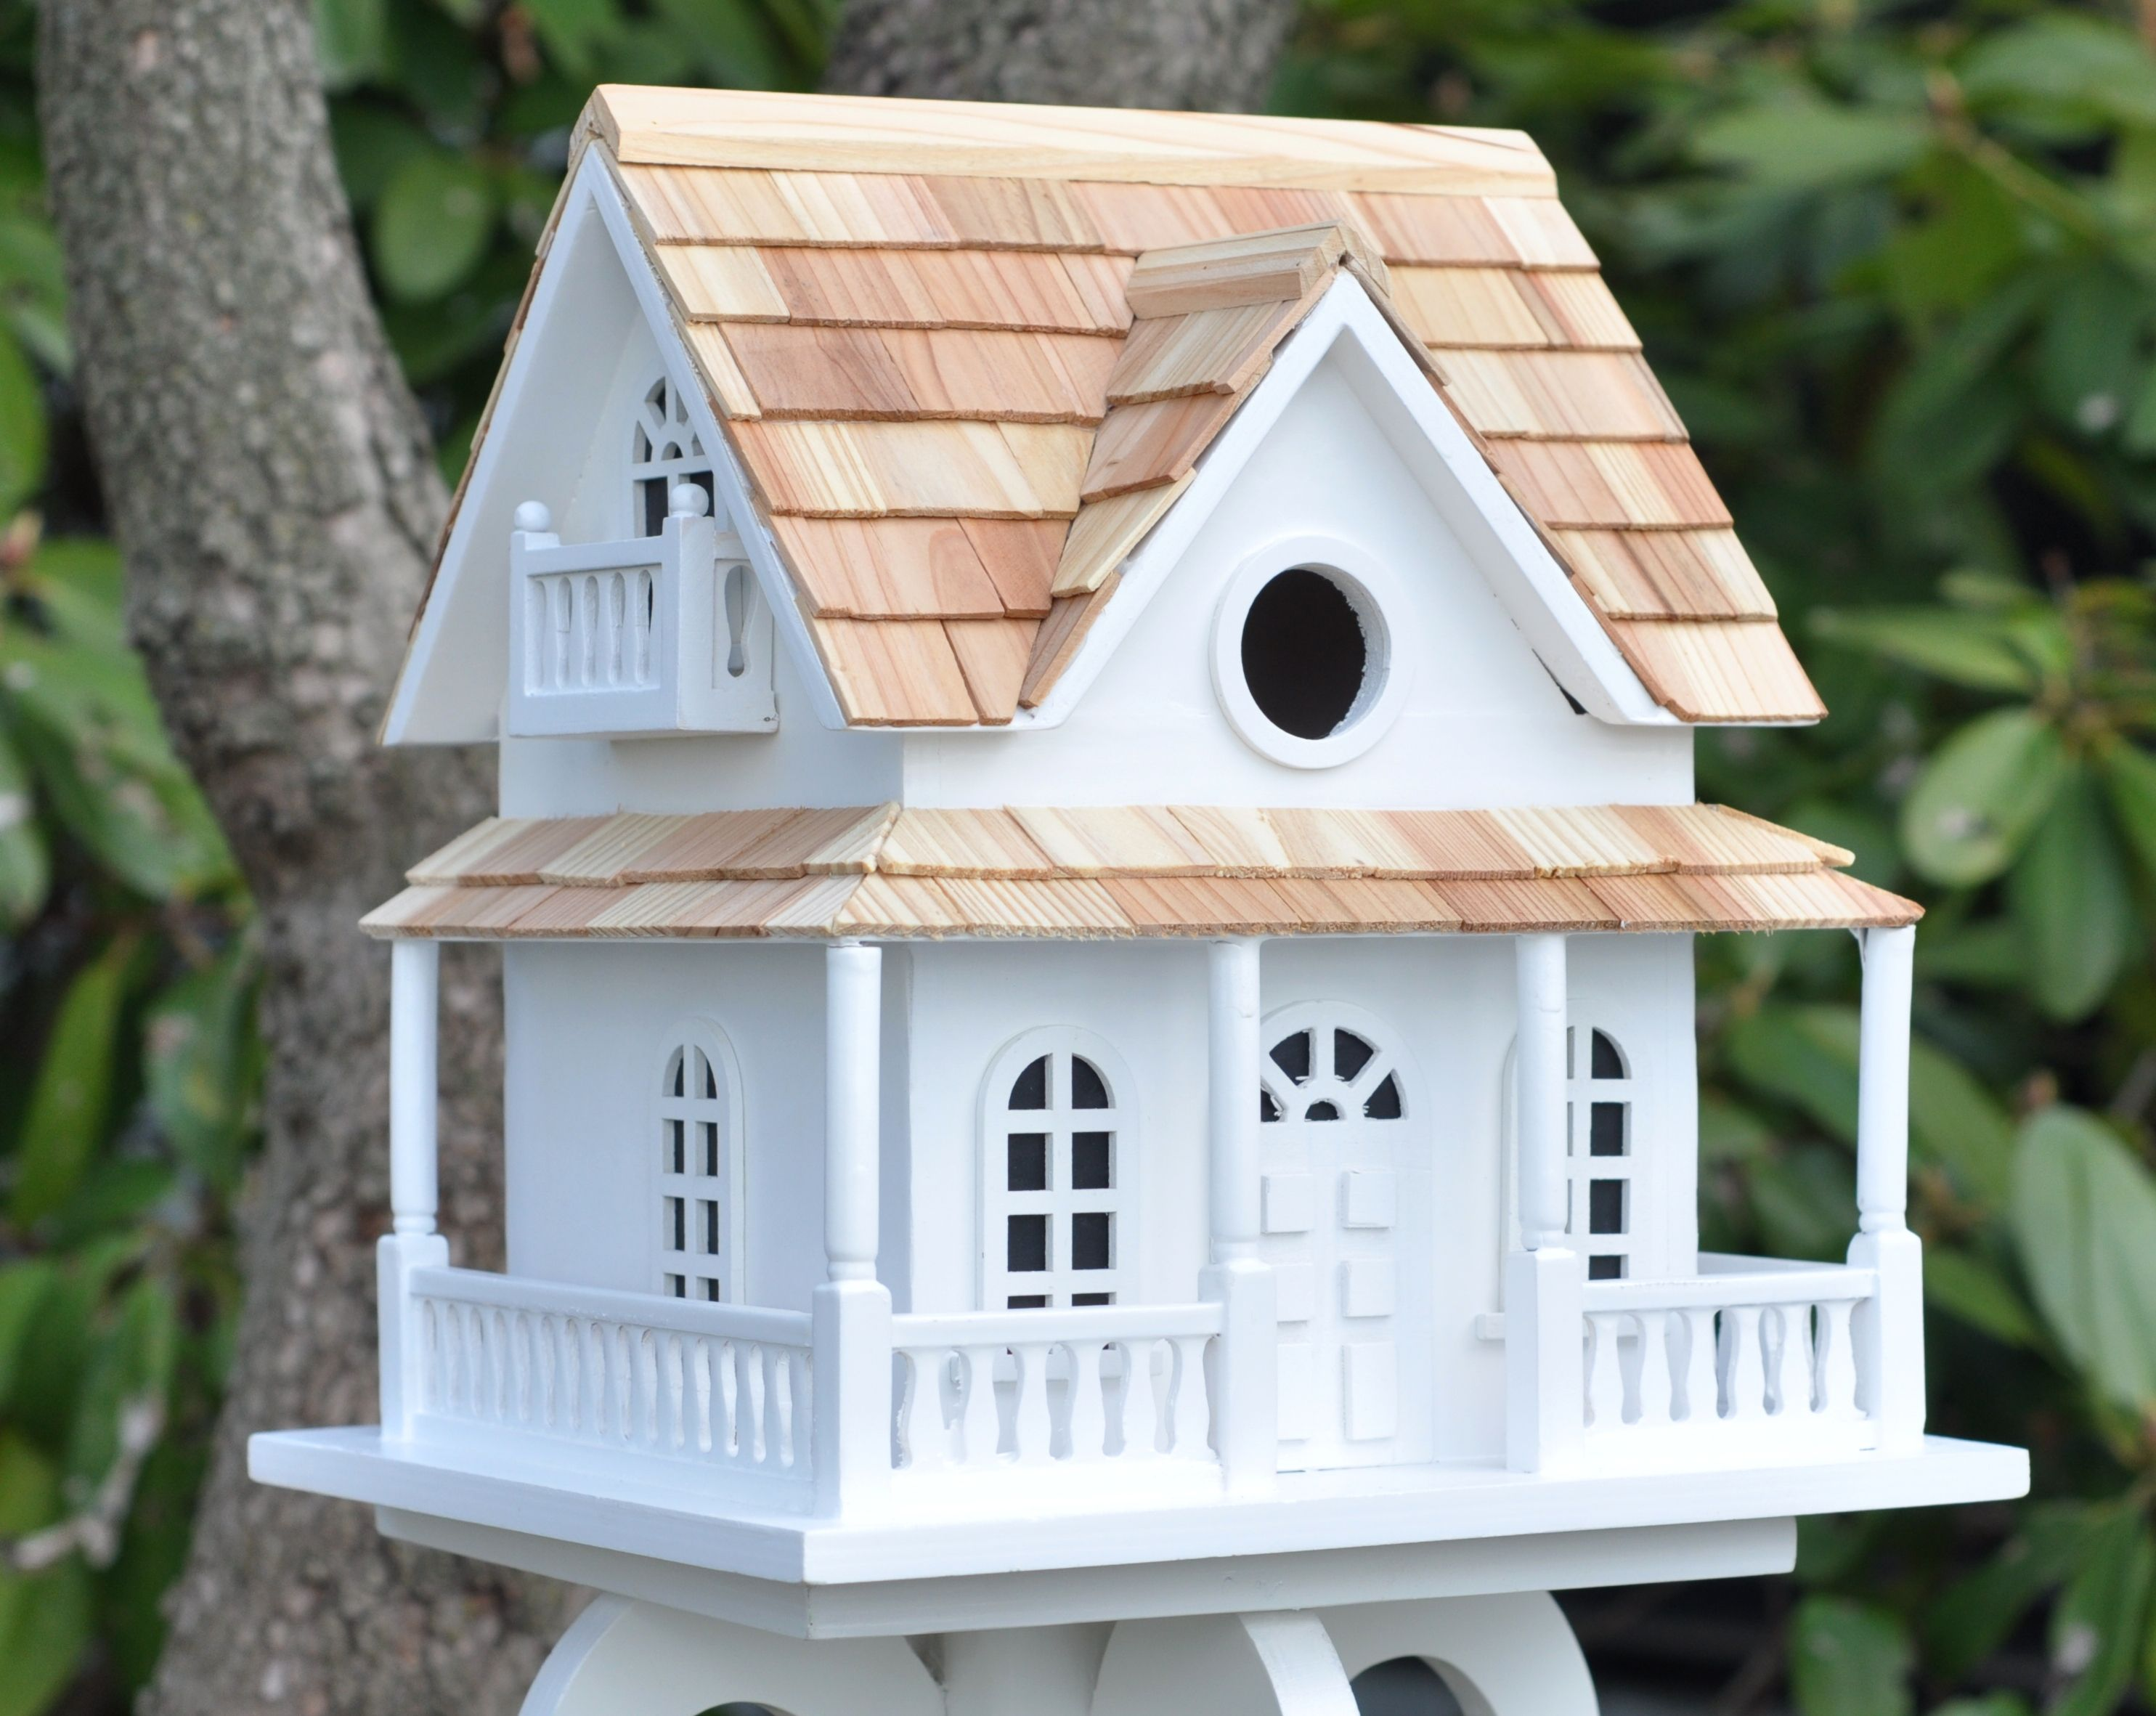 Fancy Birdhouses Home Bazaar Cape May Cottage Birdhouse White